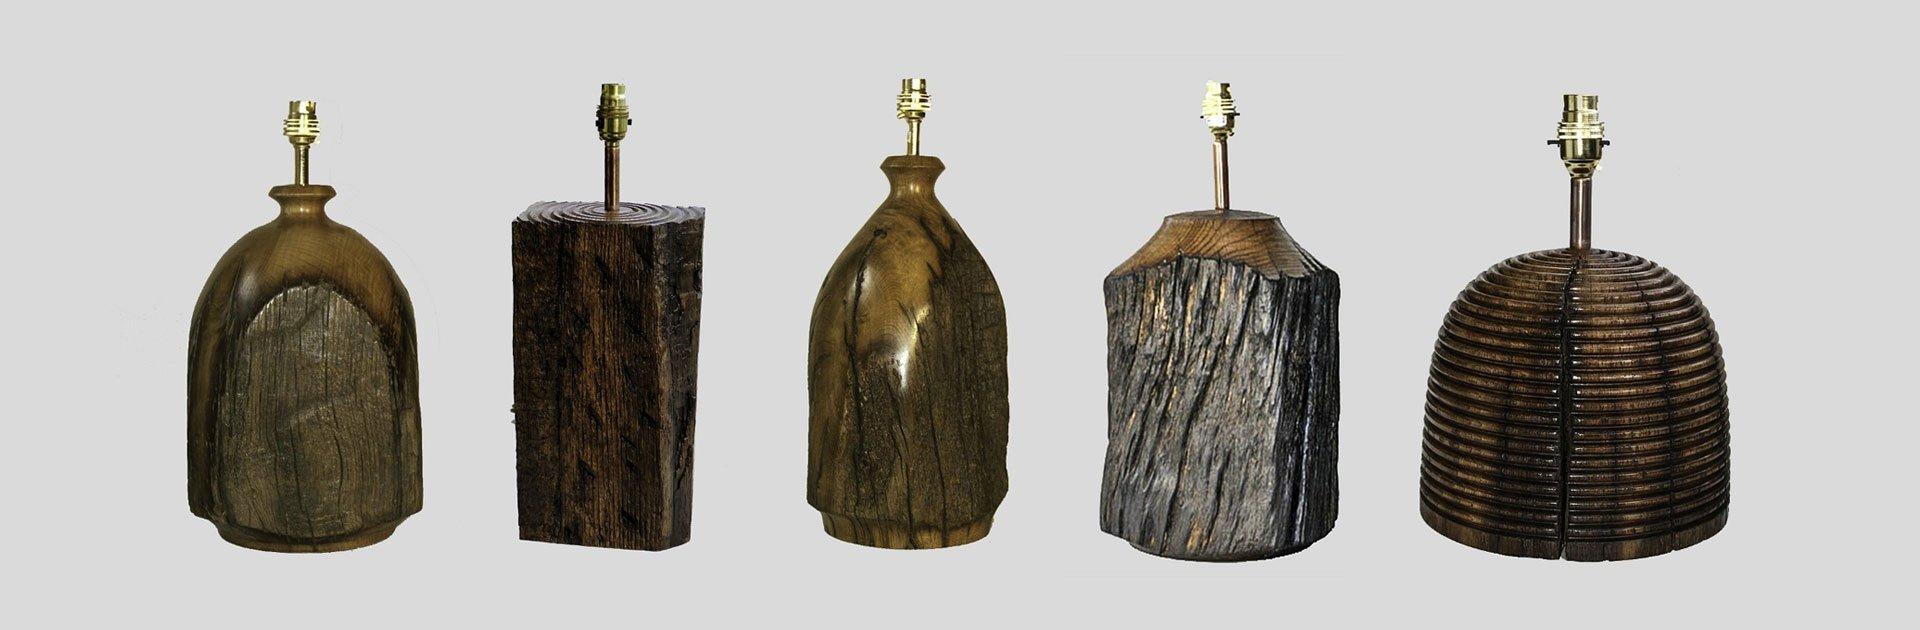 Traditional oak lamps